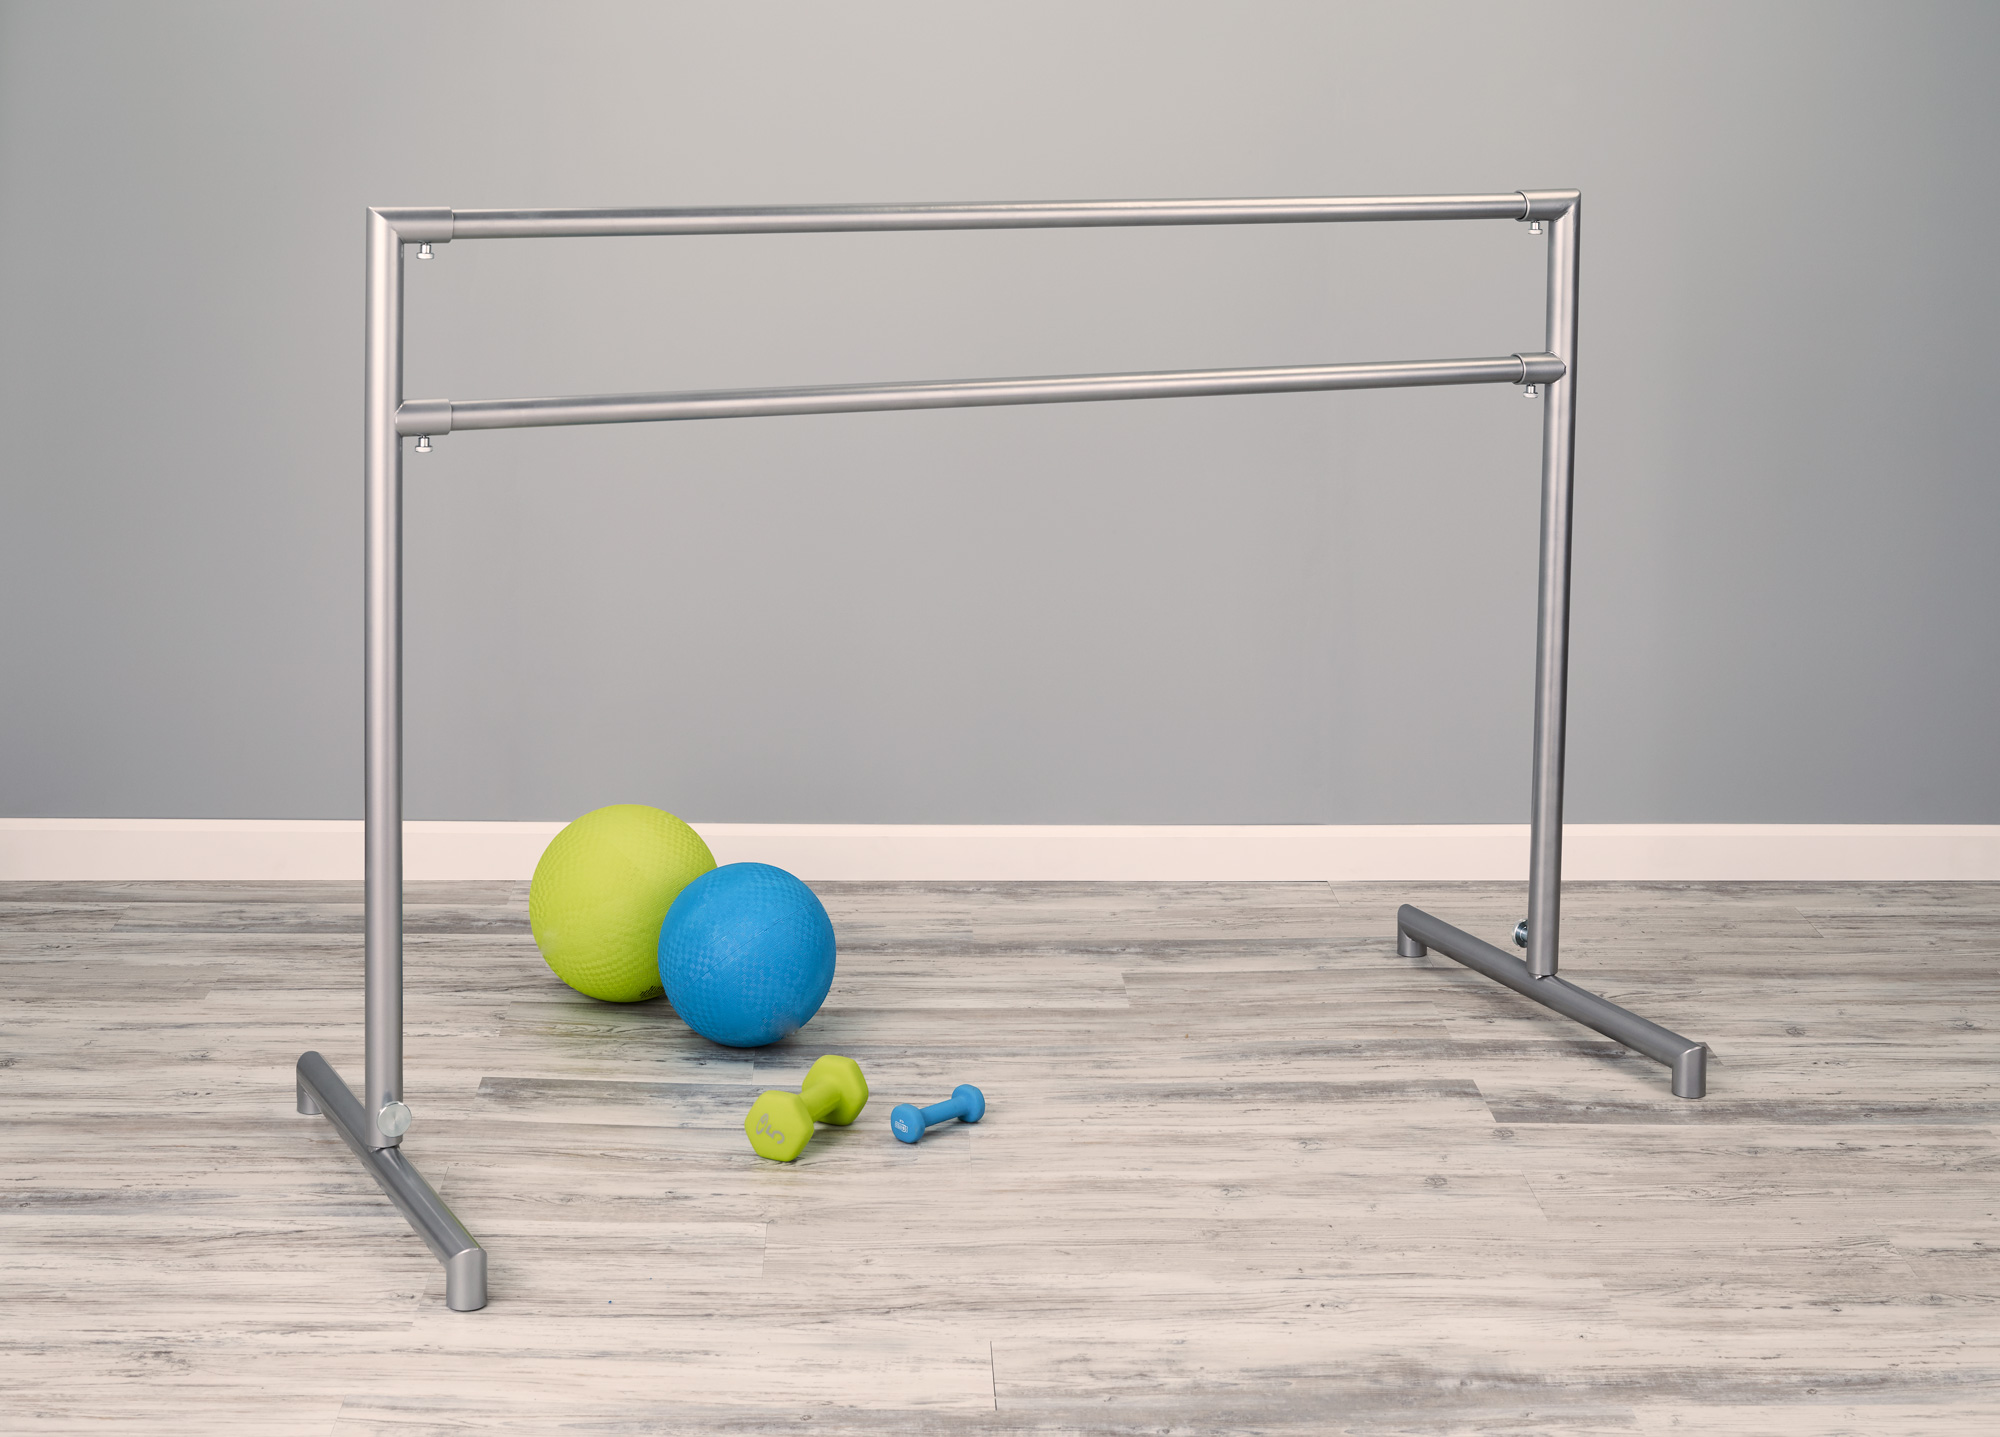 arabesque - best freestanding ballet barre - portable ballet barre by Custom Barres